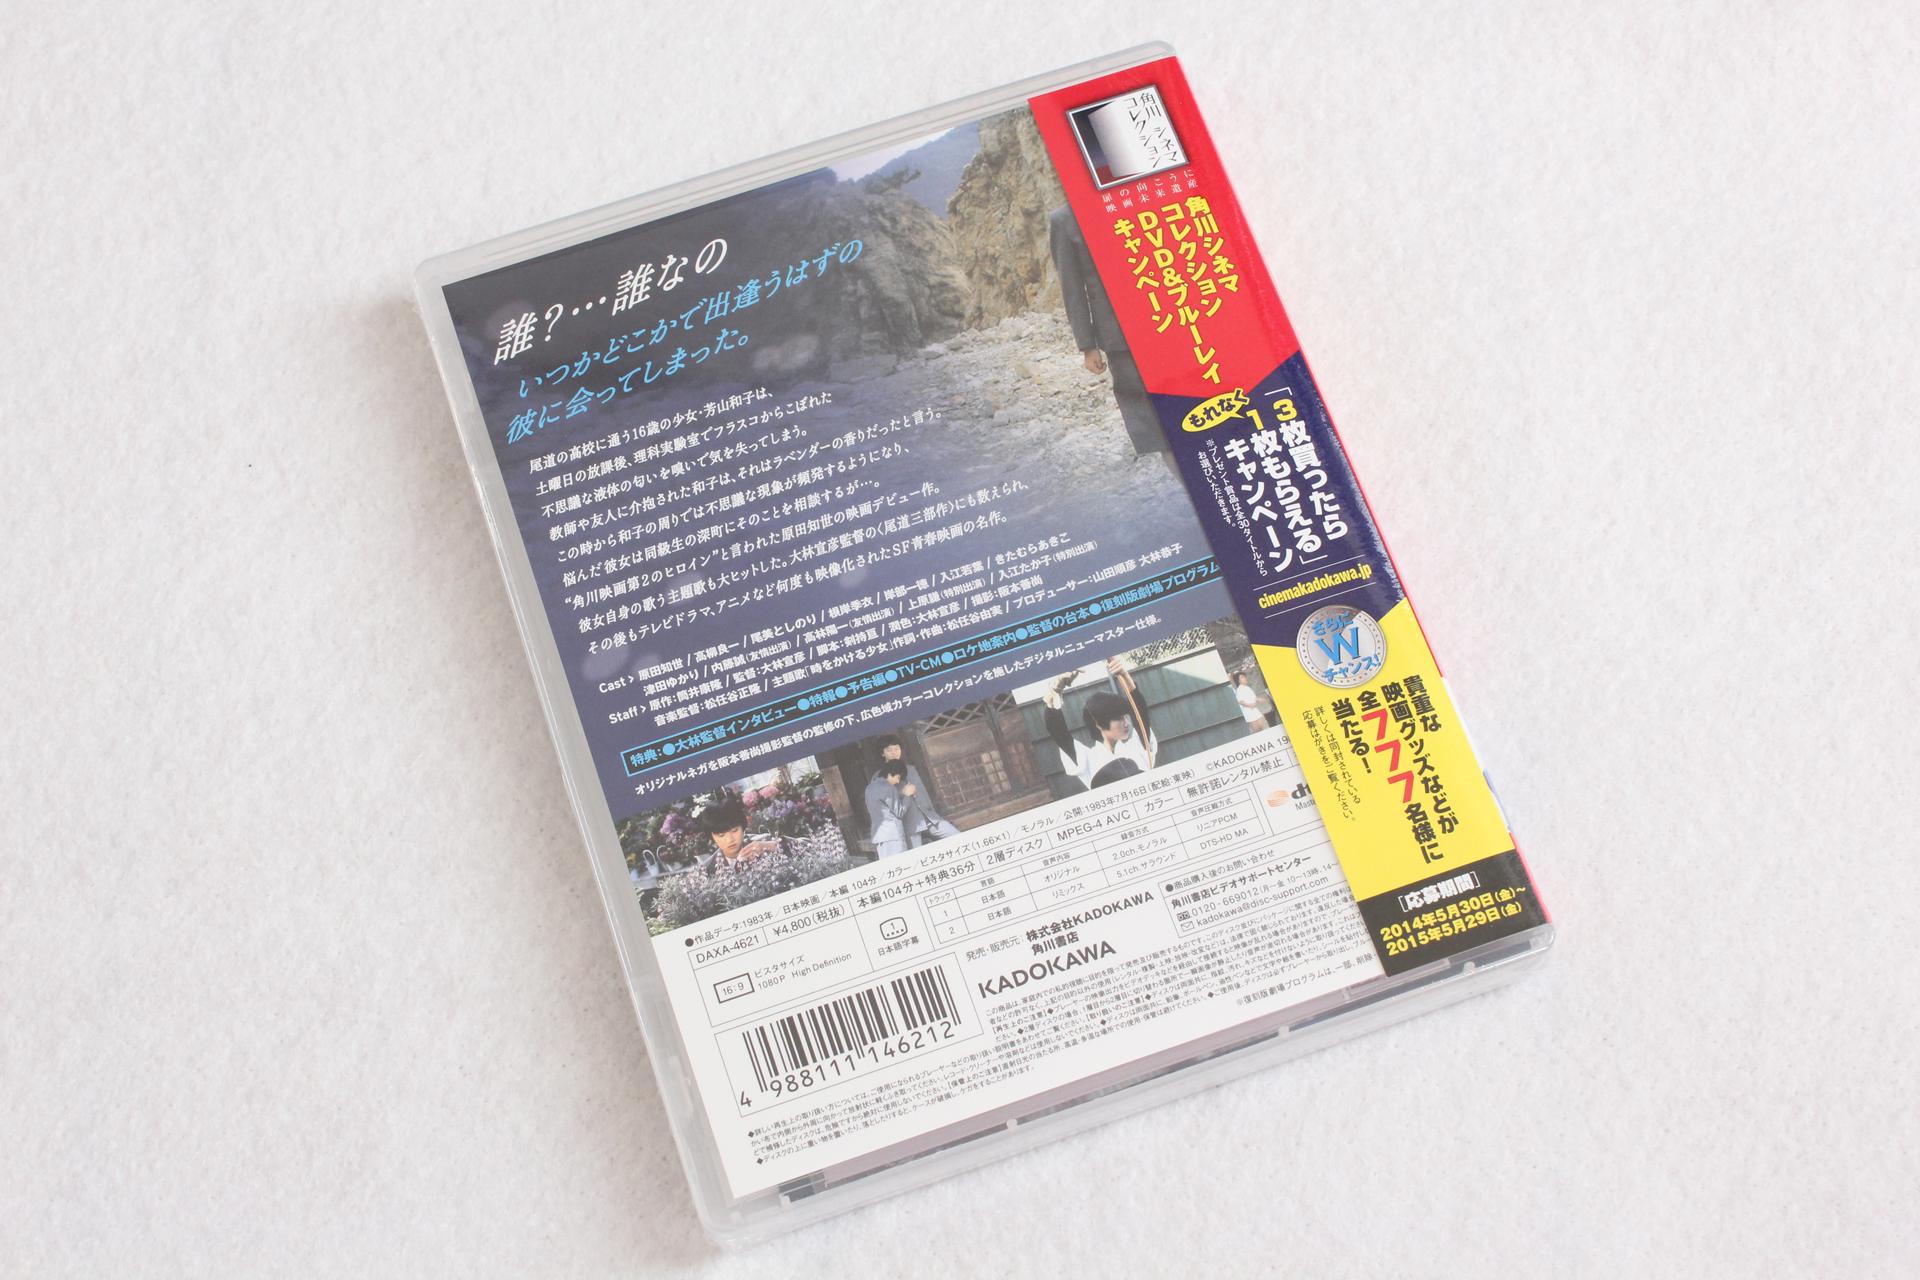 2014-12-05-TOKIKAKE_4KSCANBD-02.JPG